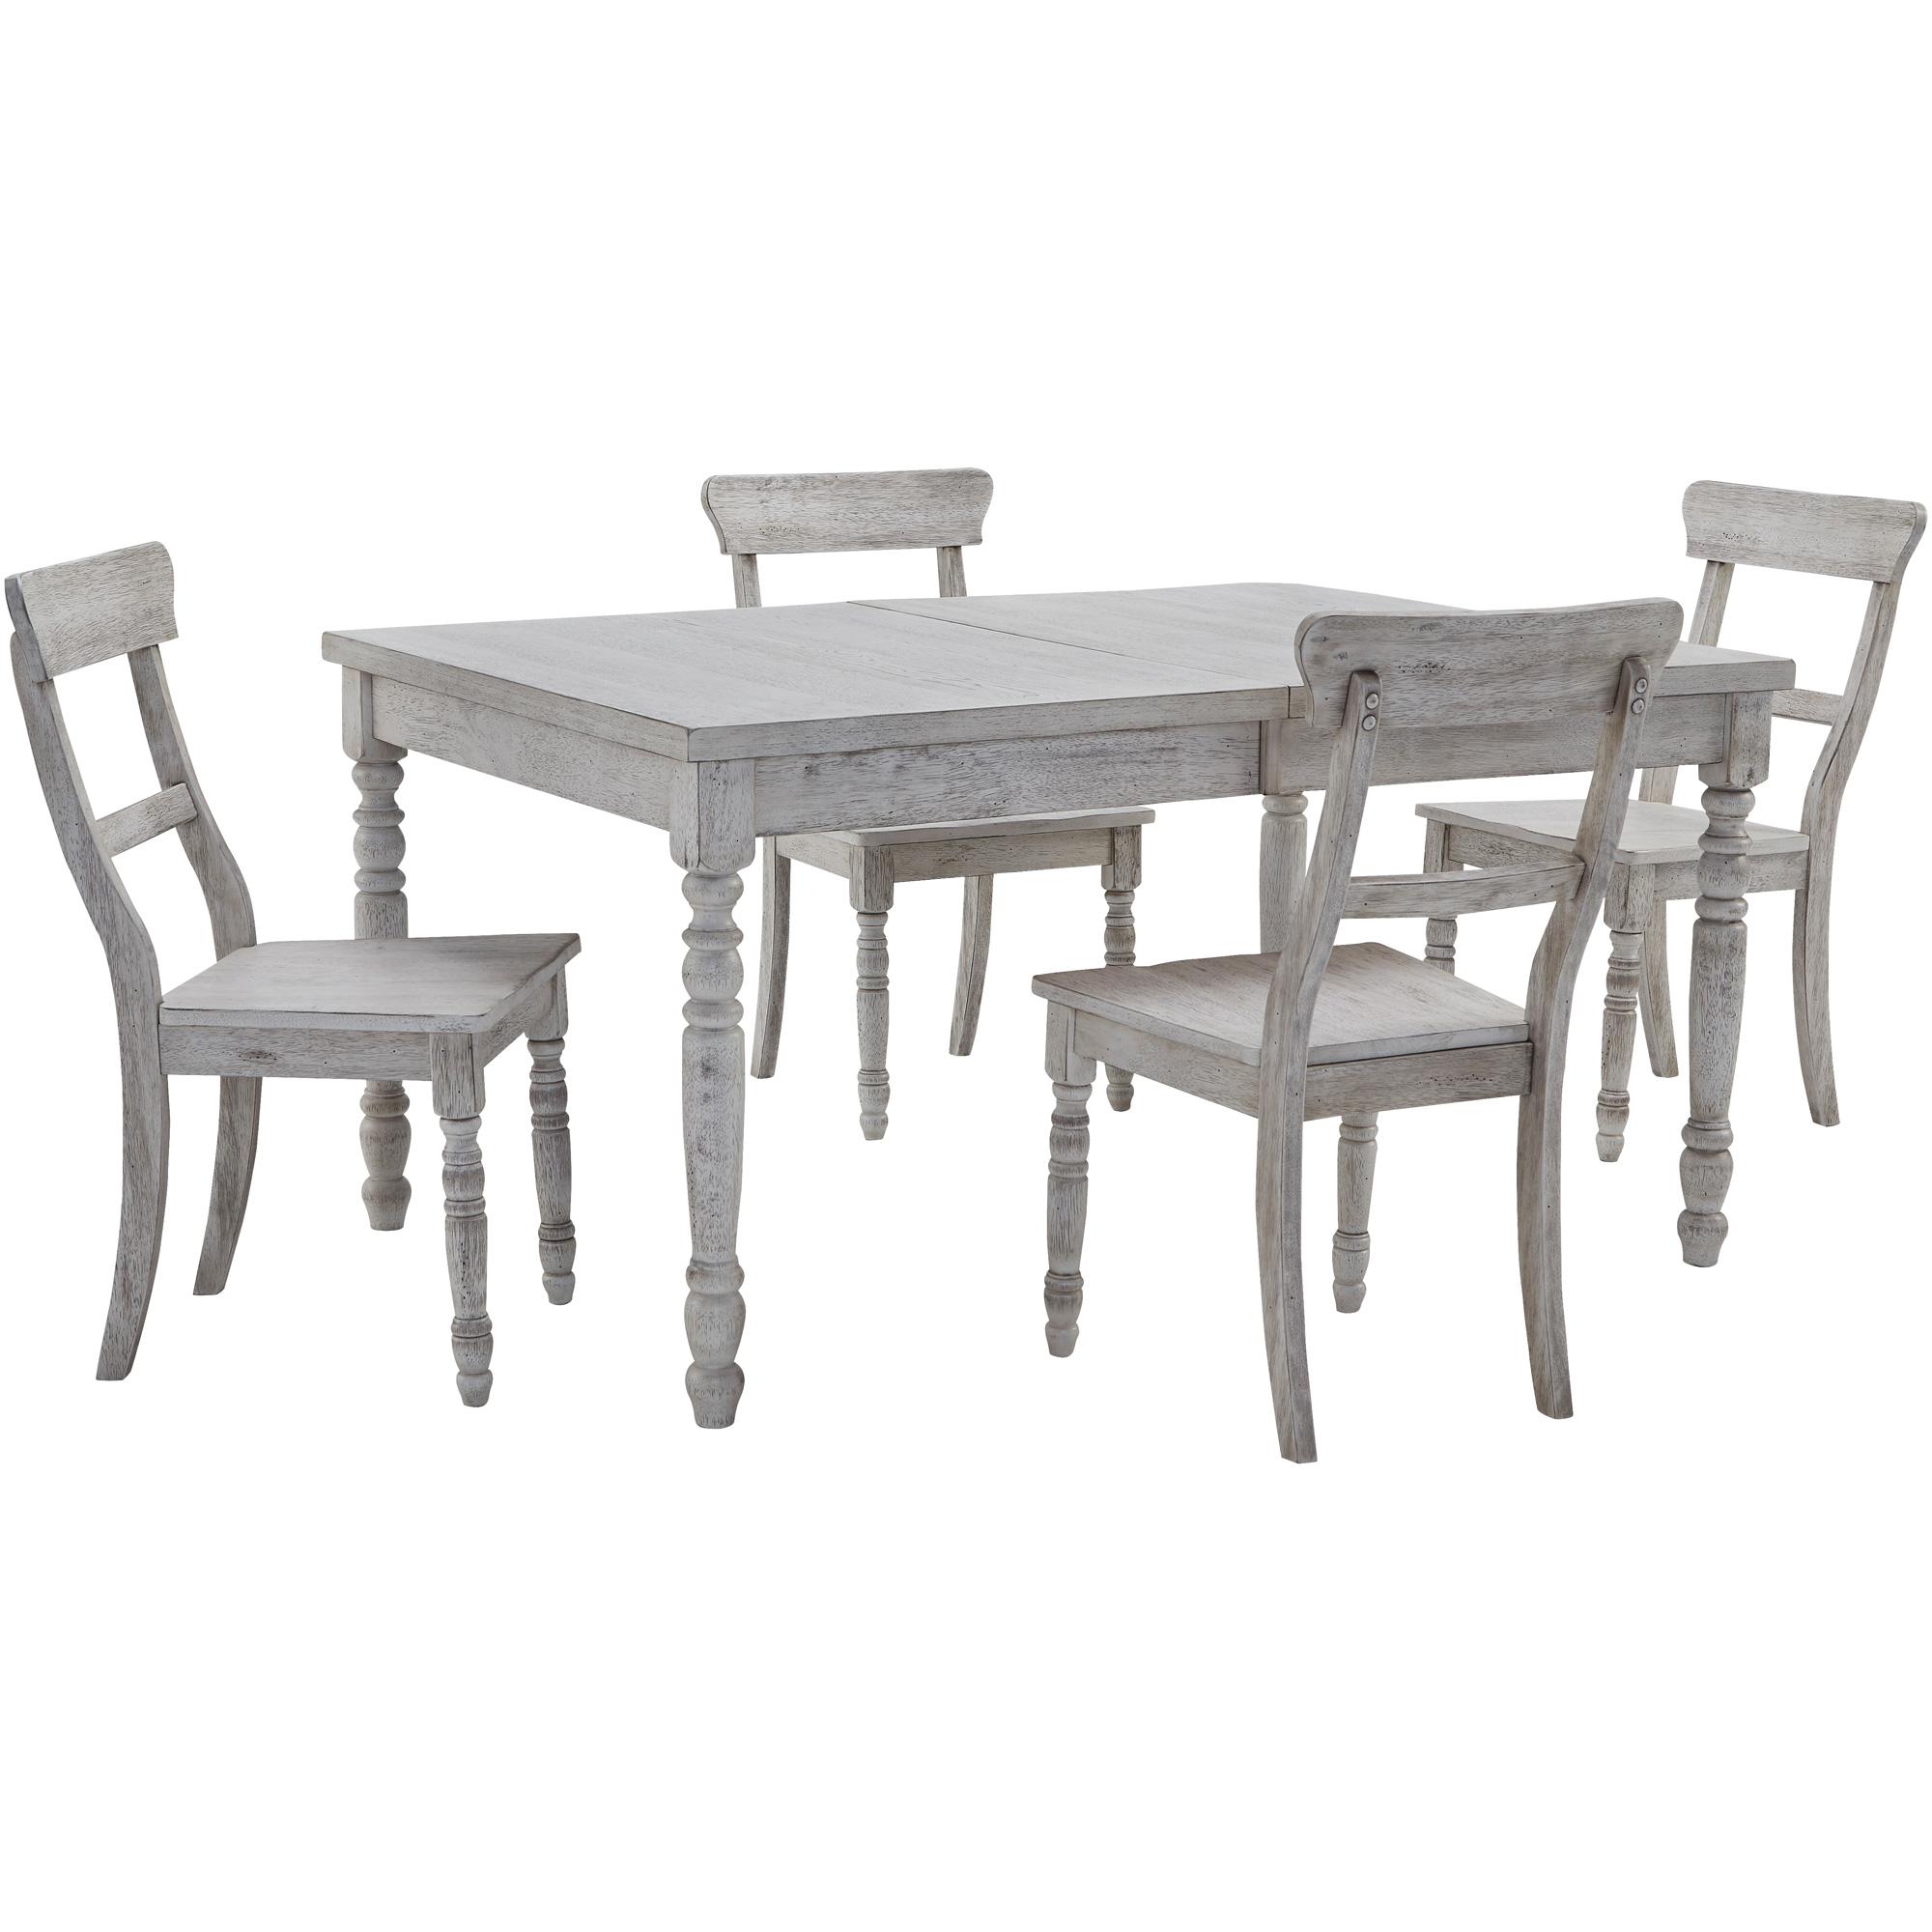 Progressive Furniture Inc. | Savannah Court Antique White 5 Piece Dining Set